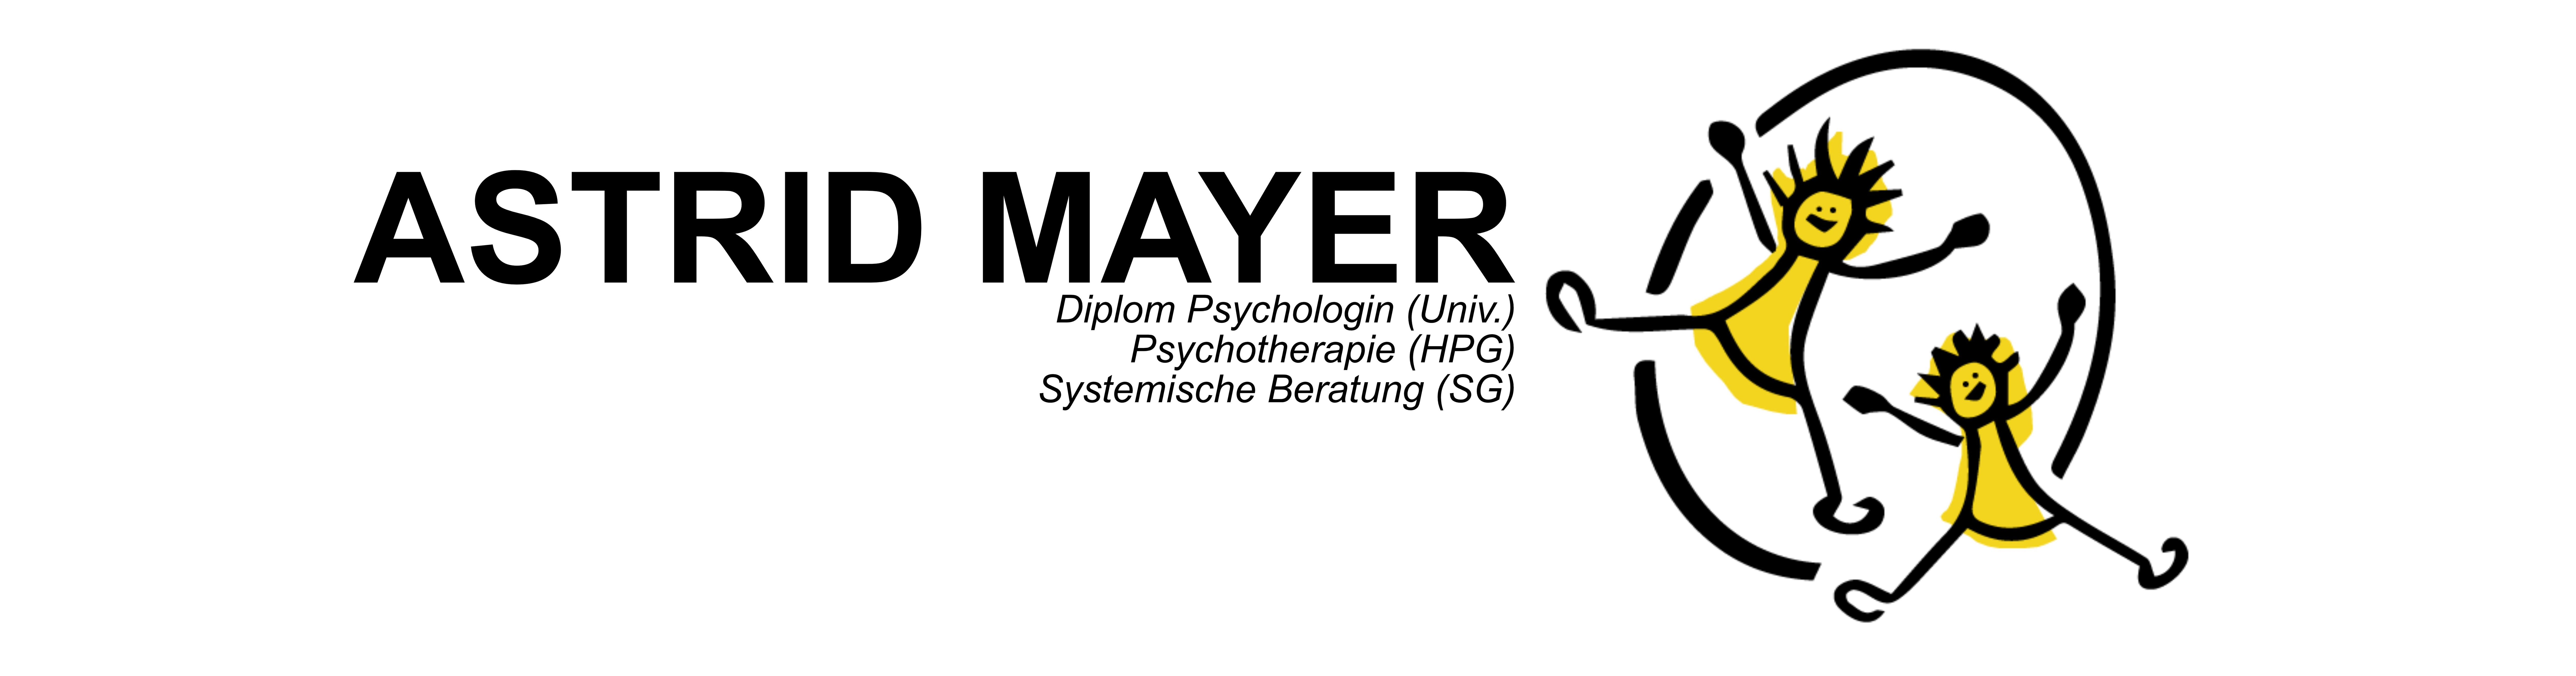 Astrid Mayer, Diplom-Psychologin (Univ.)